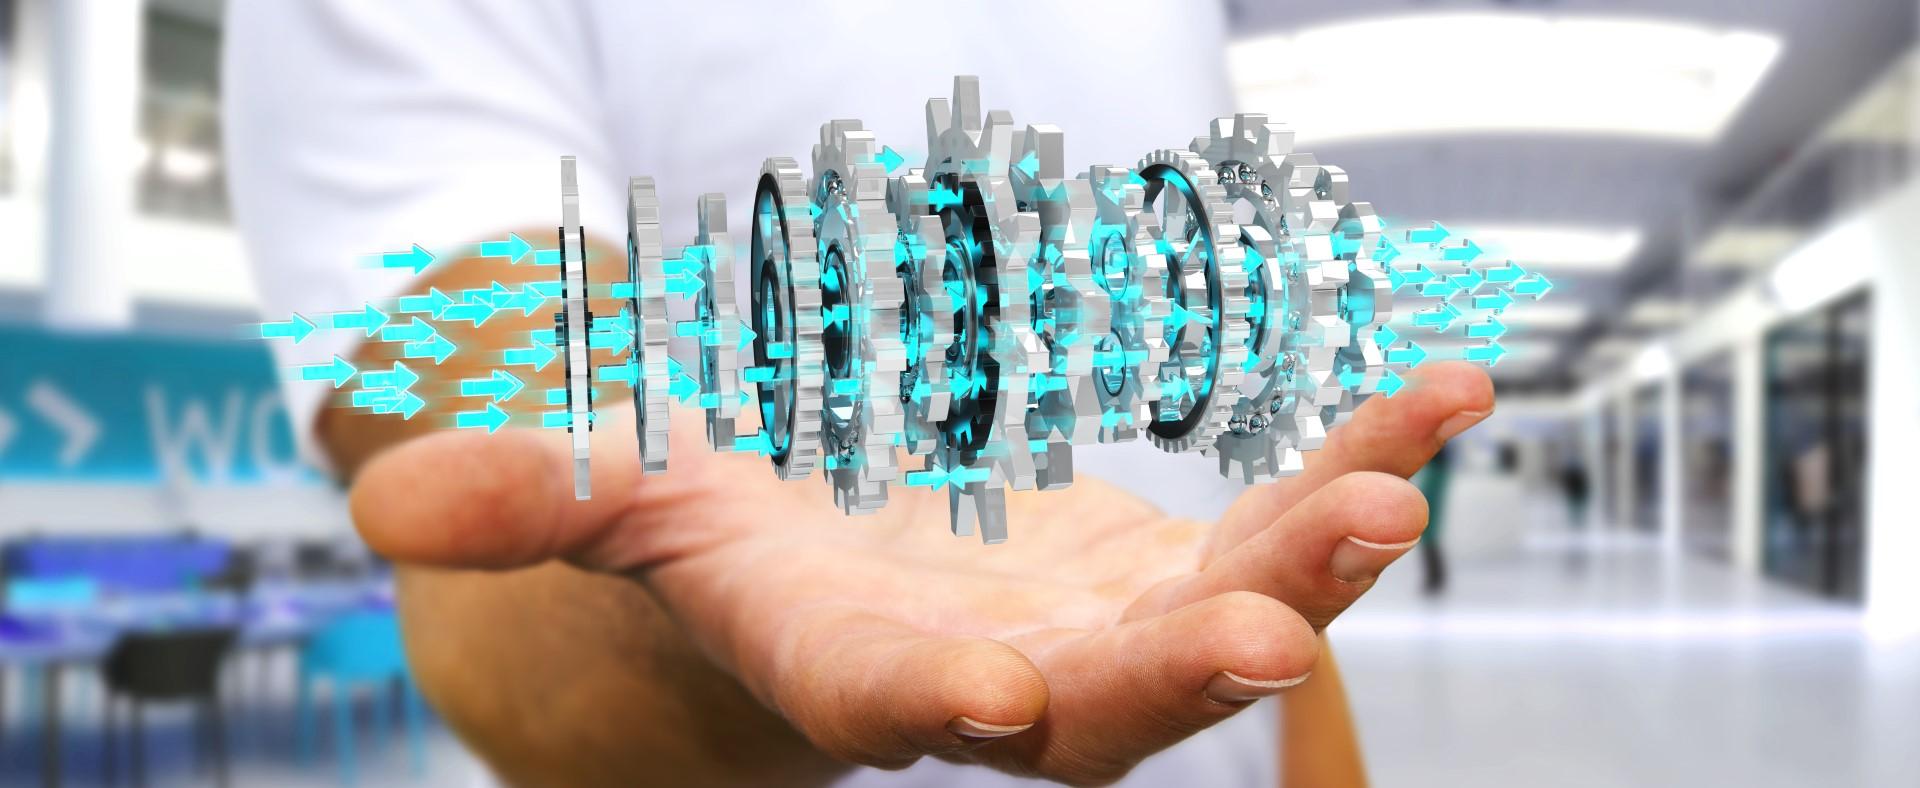 EDF Group to build 1 petabyte private cloud platform